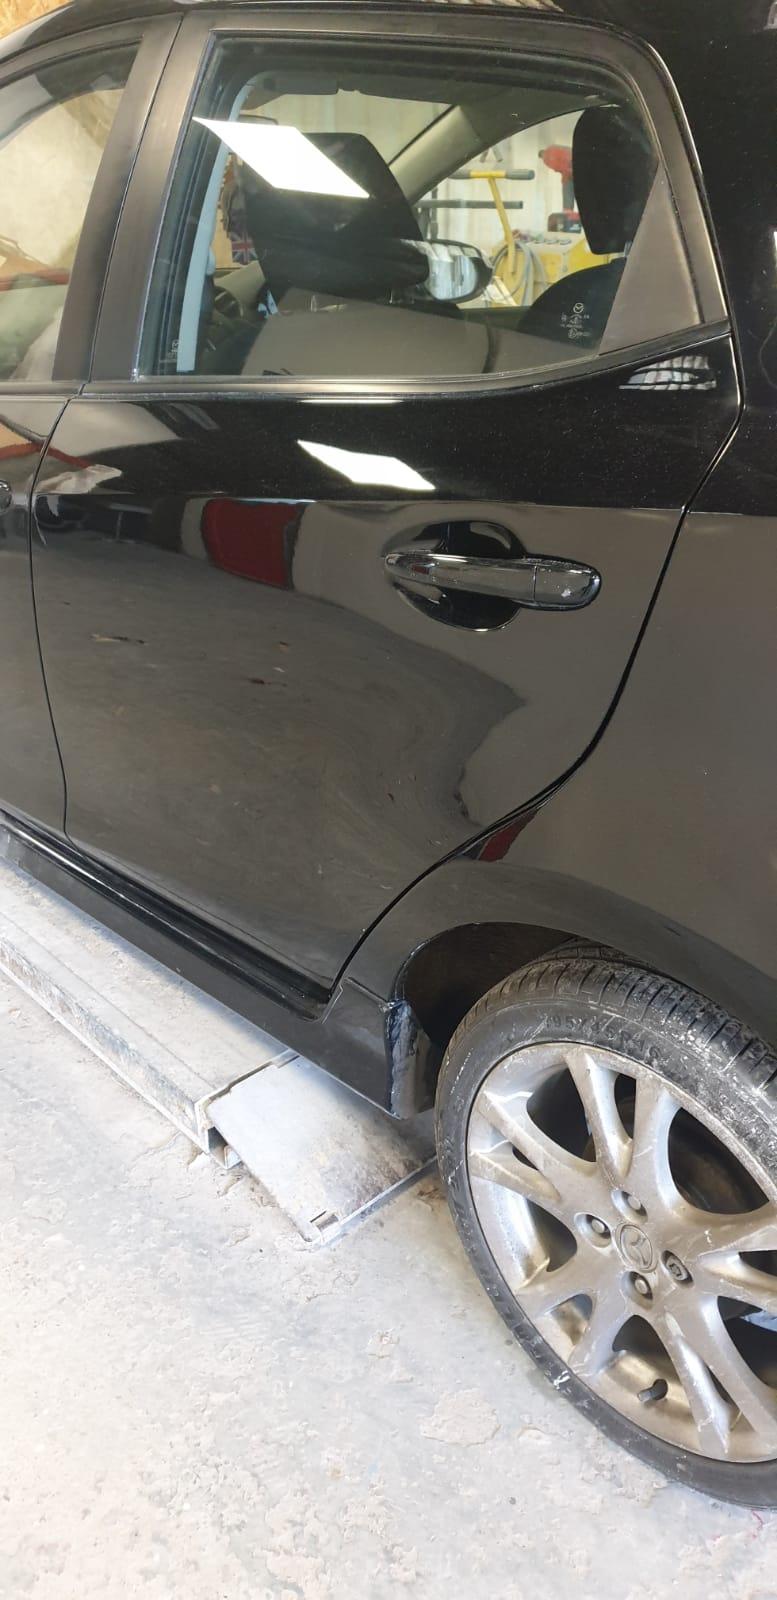 Ocean Sprays - Mazda After 1